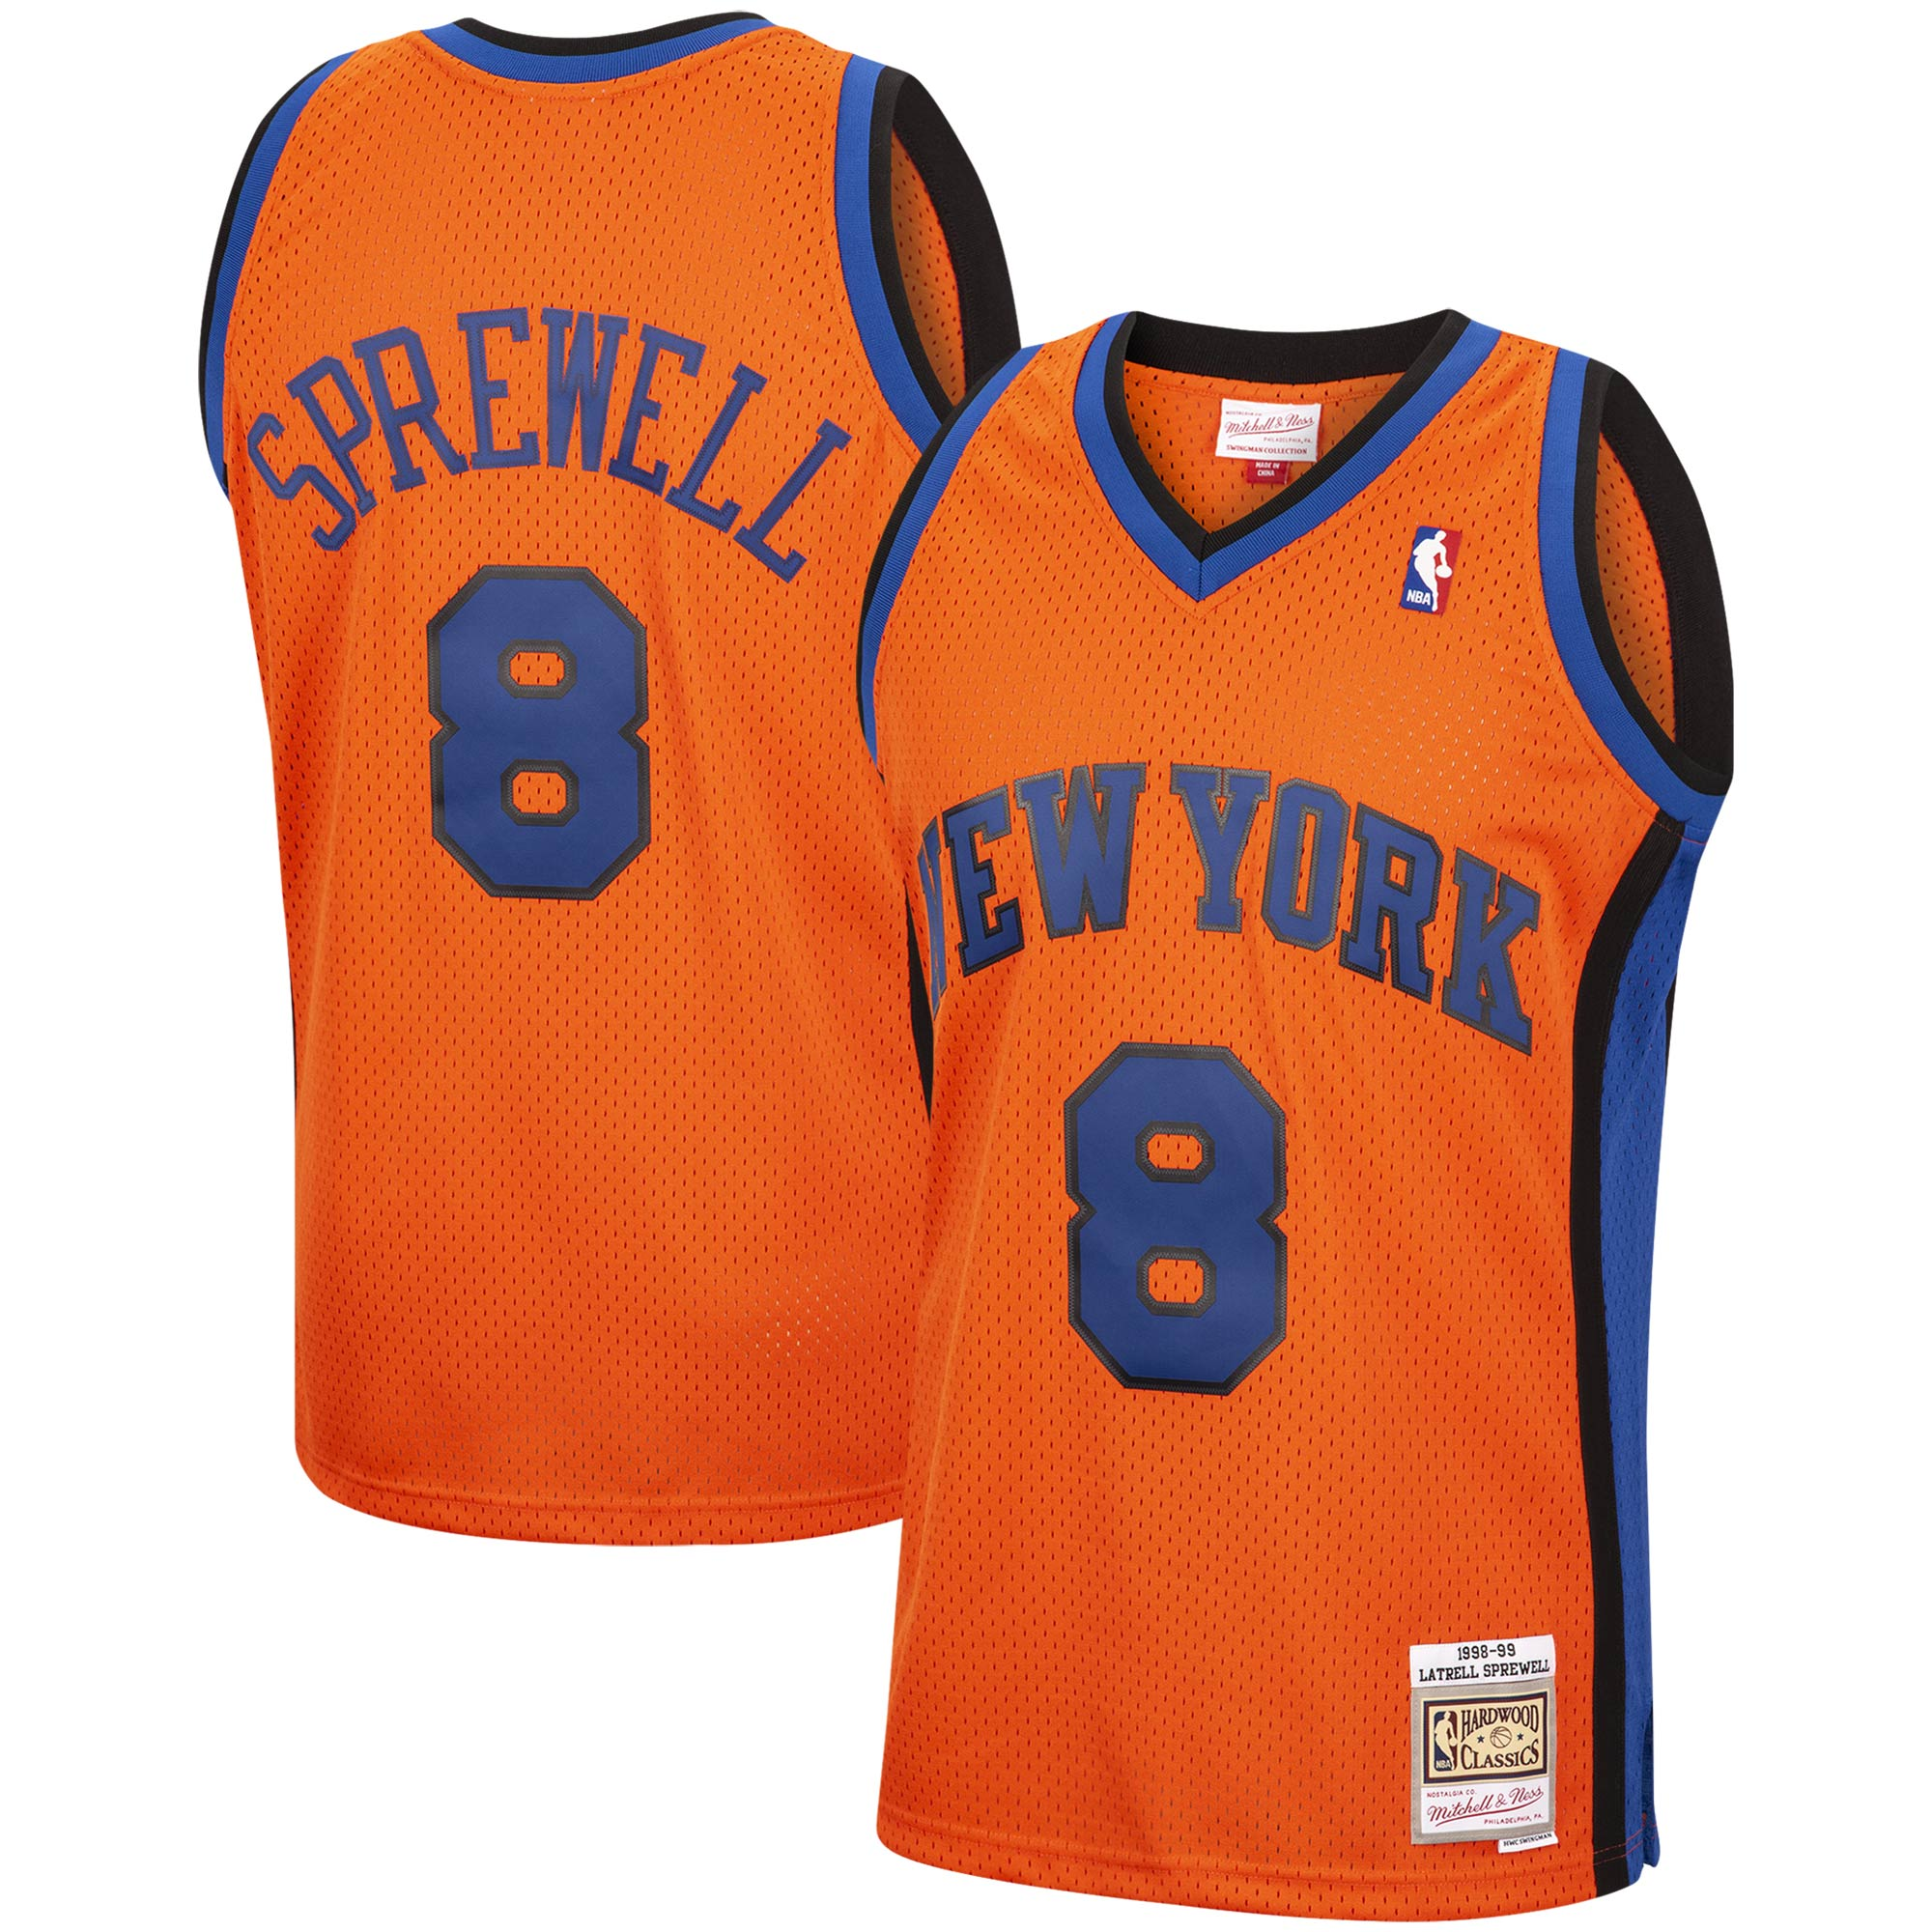 Latrell Sprewell New York Knicks Mitchell & Ness 1998-99 Hardwood Classics Reload Swingman Jersey - Orange